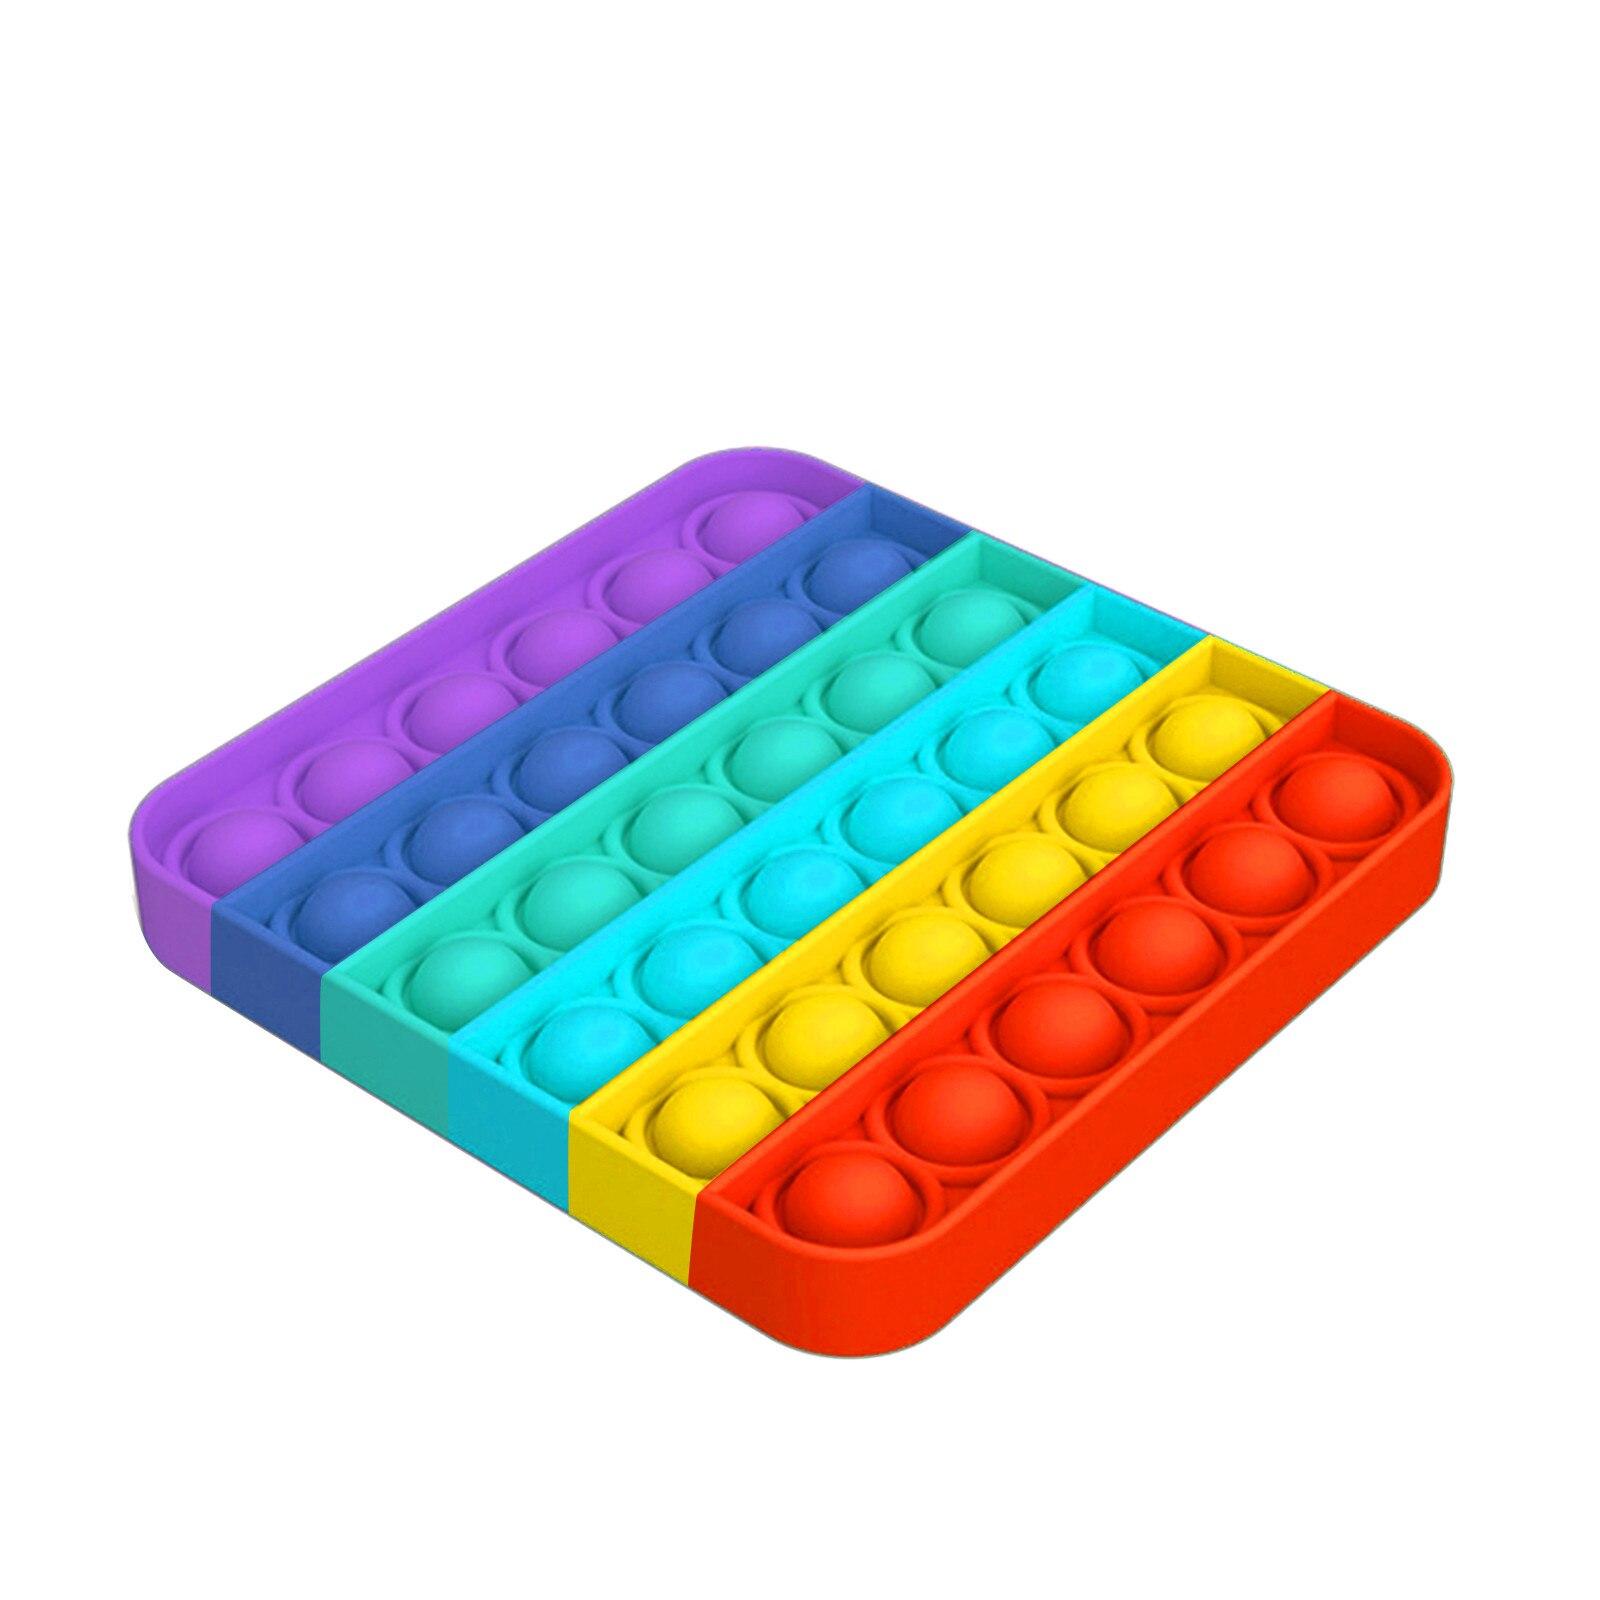 It-Fidget-Toy Reliever-Toys Anti-Stress Bubble-Sensory Pops Funny Popit Popp Push Child img2